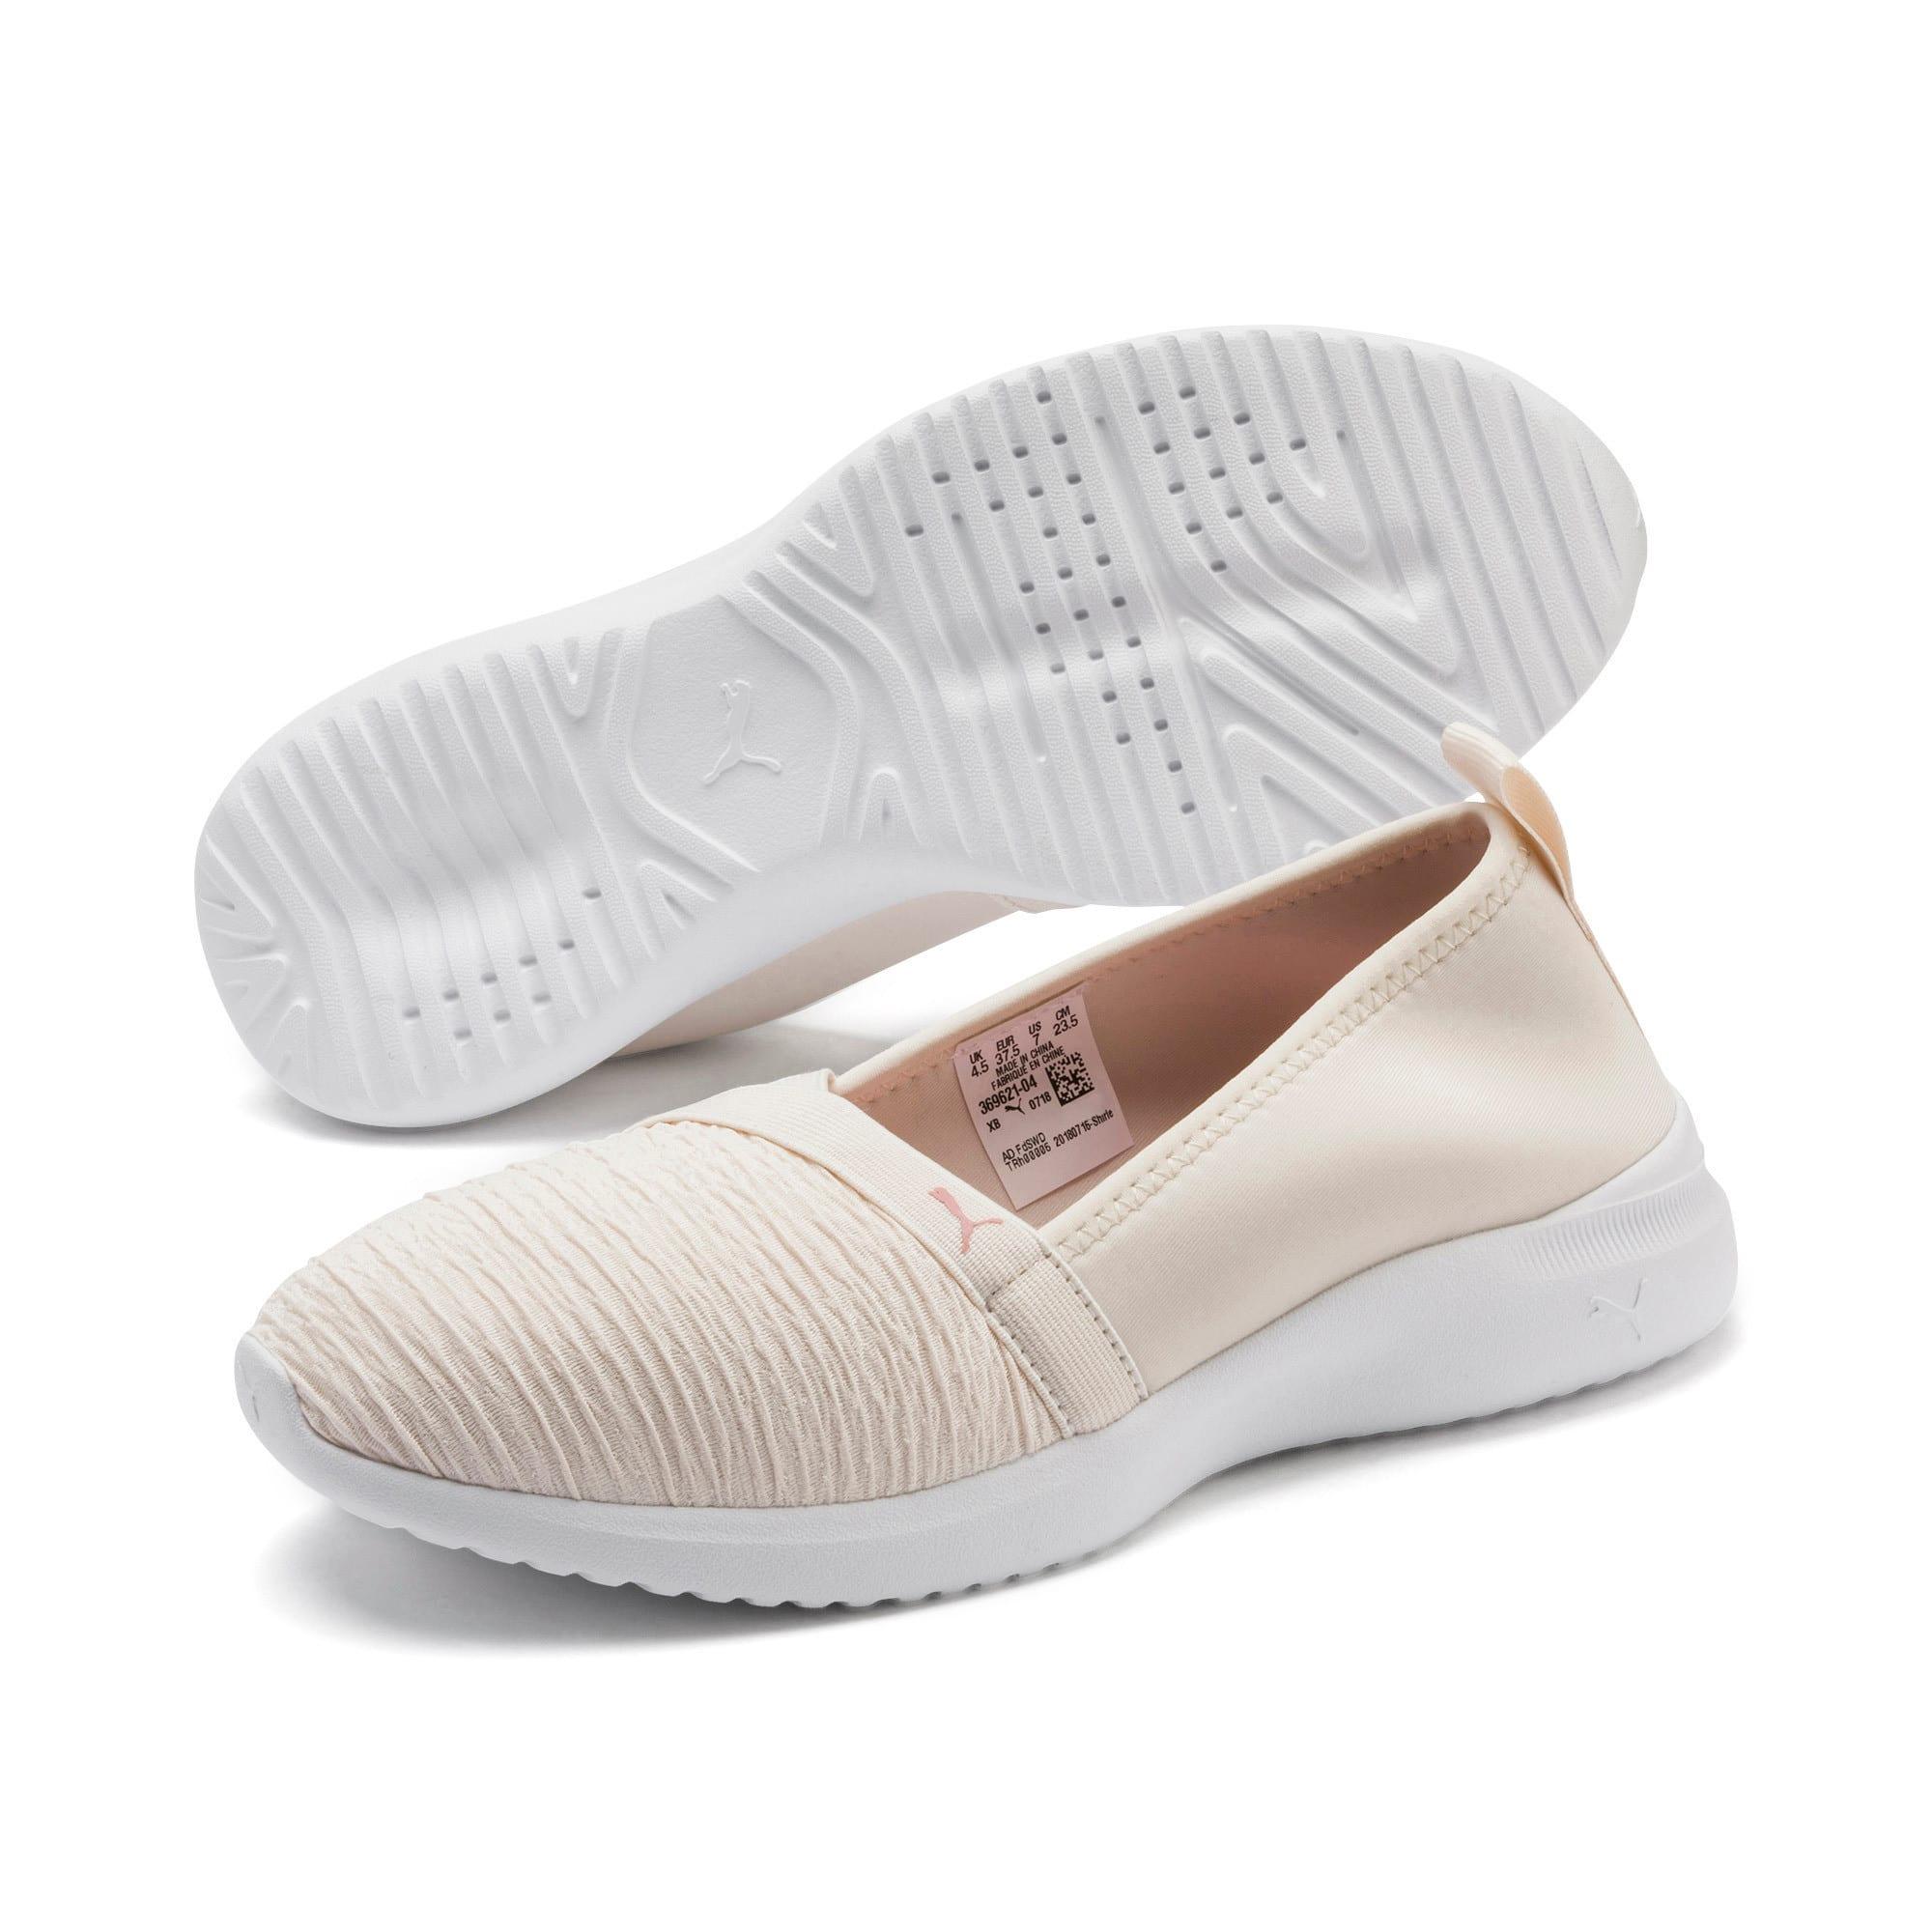 Thumbnail 3 of Adelina Women's Ballet Shoes, Pastel Parchment-B Rose-Wht, medium